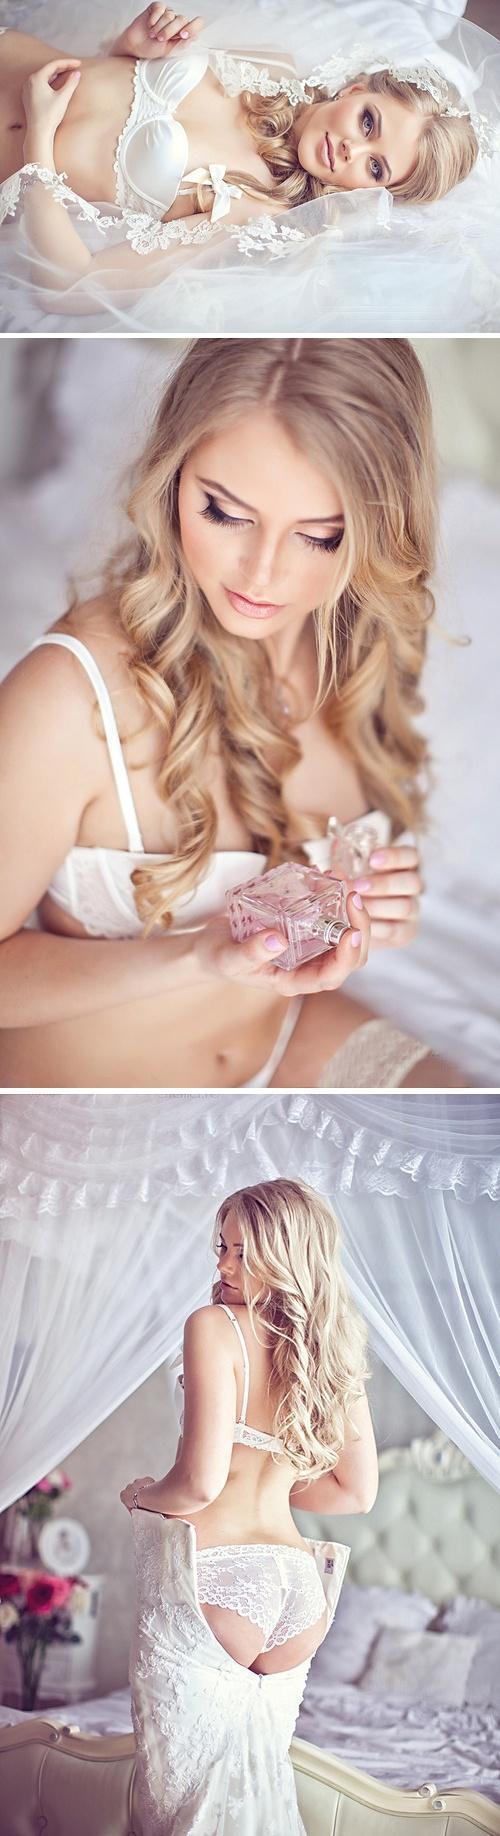 Mariage - ♥ Bridal Boudoir & Lingerie For Wedding Day ♥